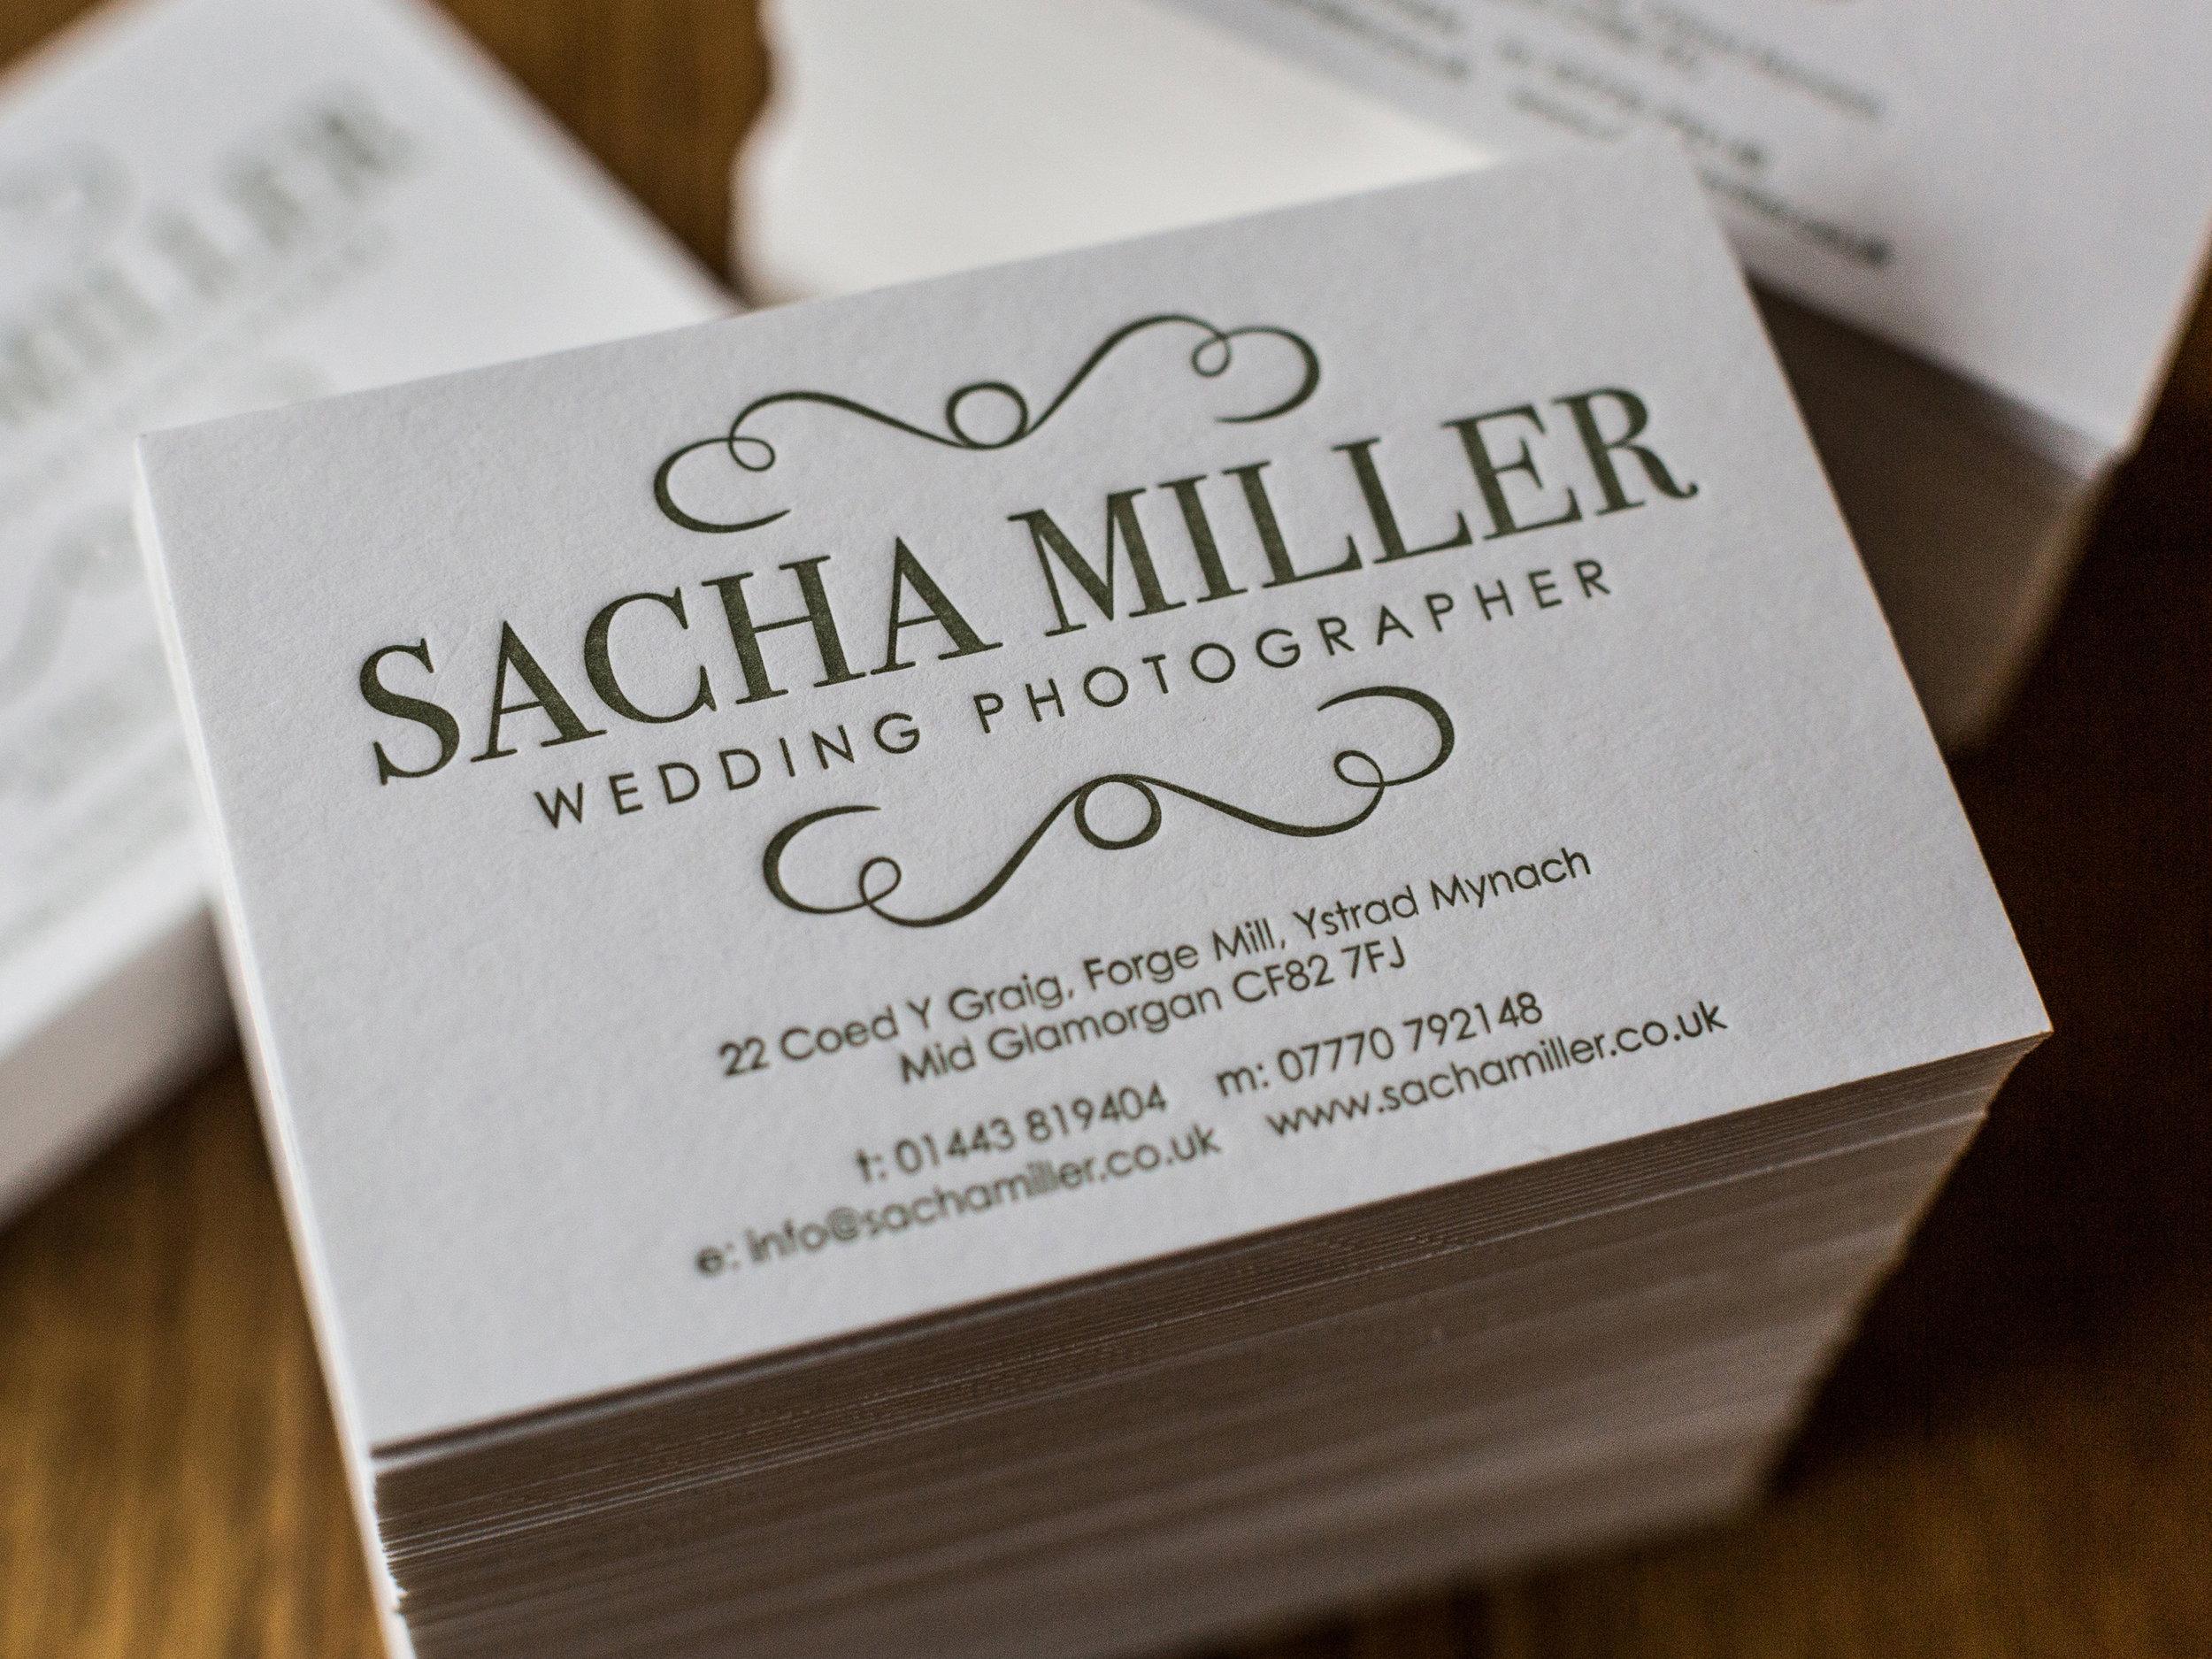 Sacha-Miller_index.jpg